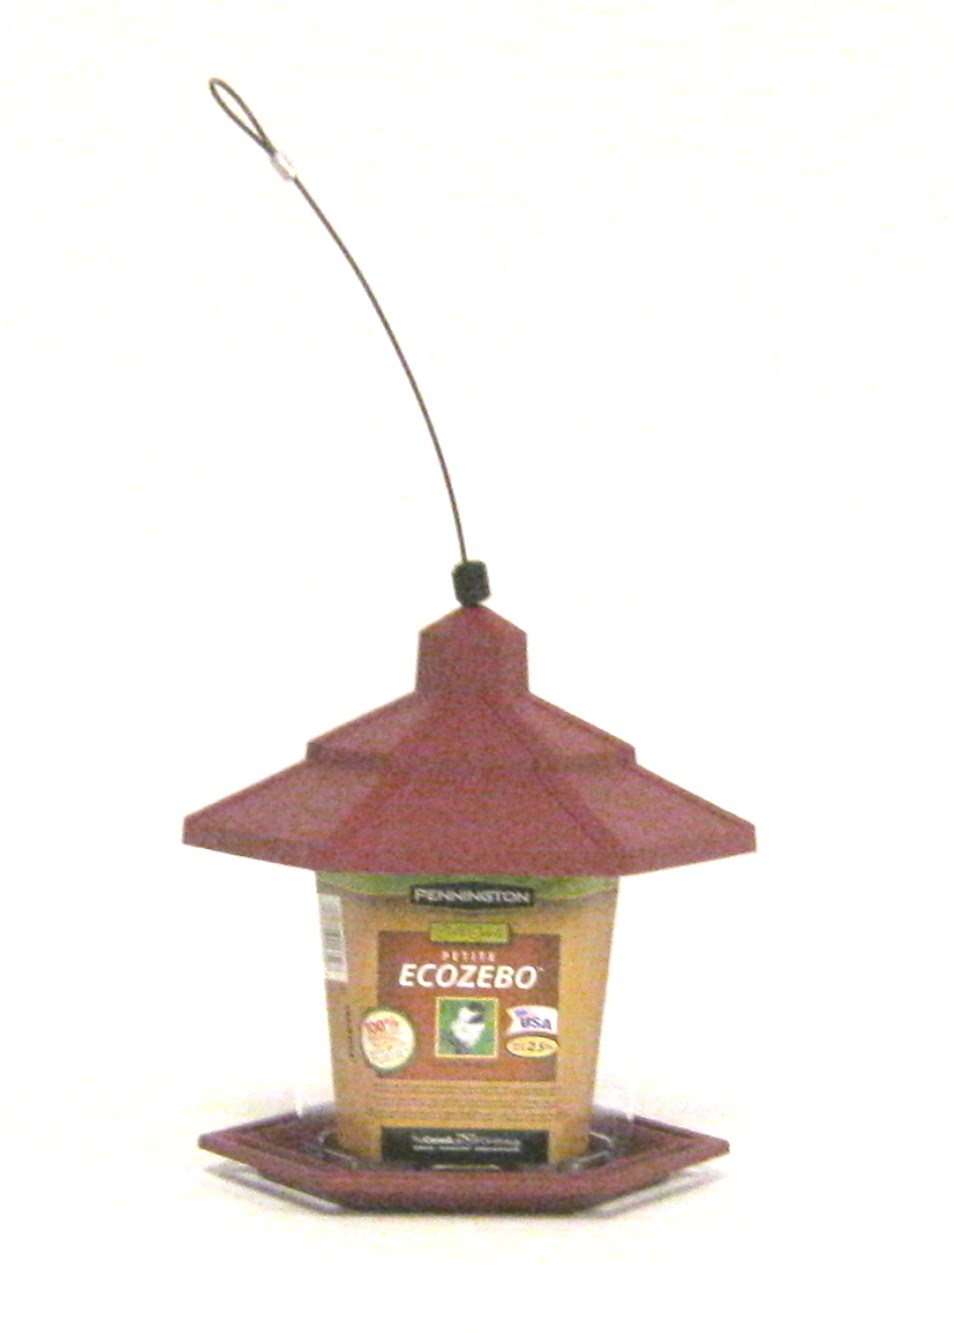 Pennington Wild Birdfeeder, Petite Ecozebo, 2.5 Pound Seed Capacity by Pennington Seed